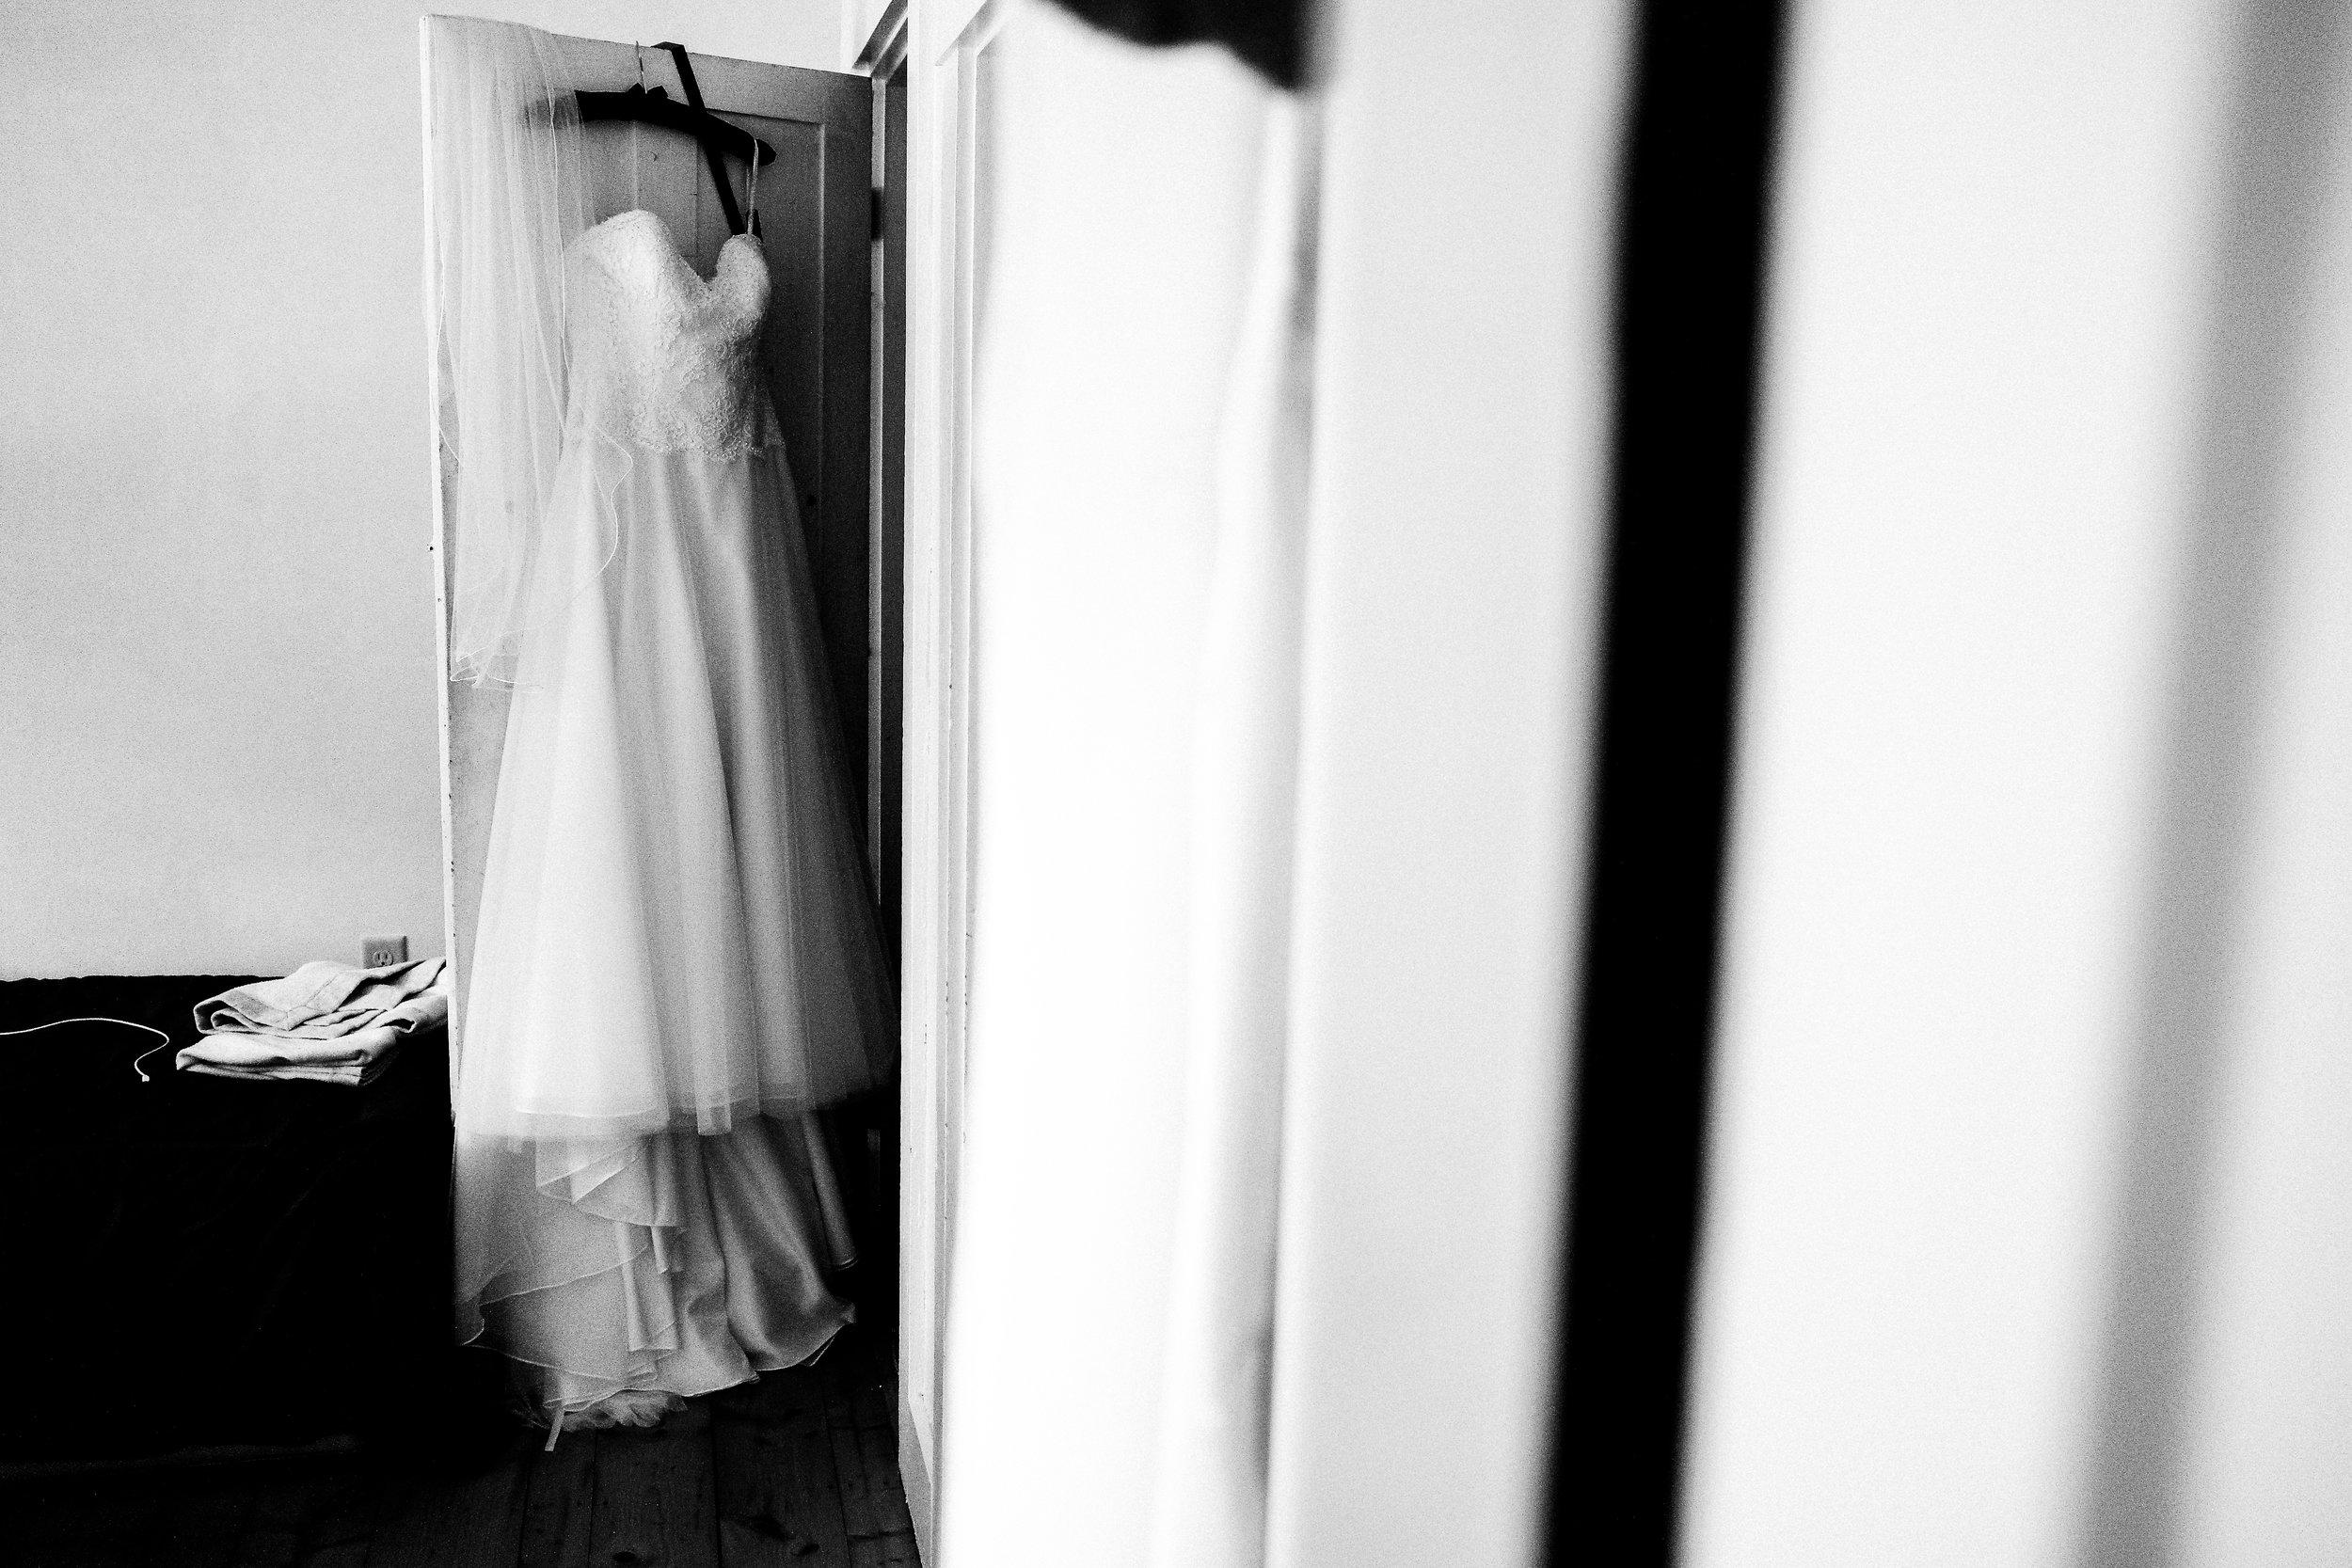 backyard-nh-wedding-photography-73.jpg